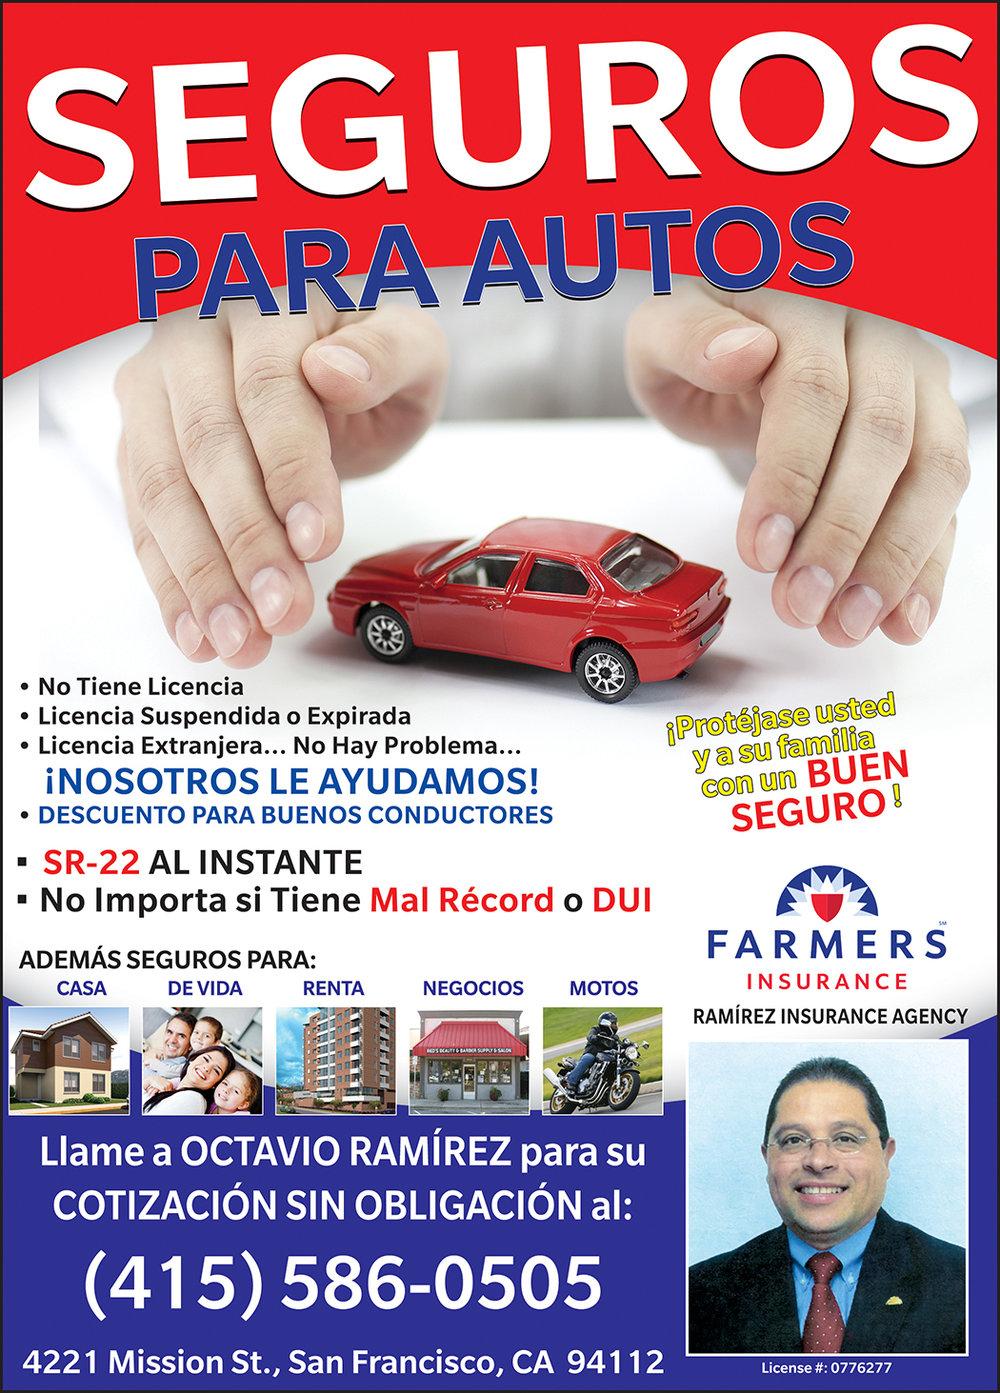 Octavio Ramirez - Farmers 1 Pag Agosto 2018 copy.jpg